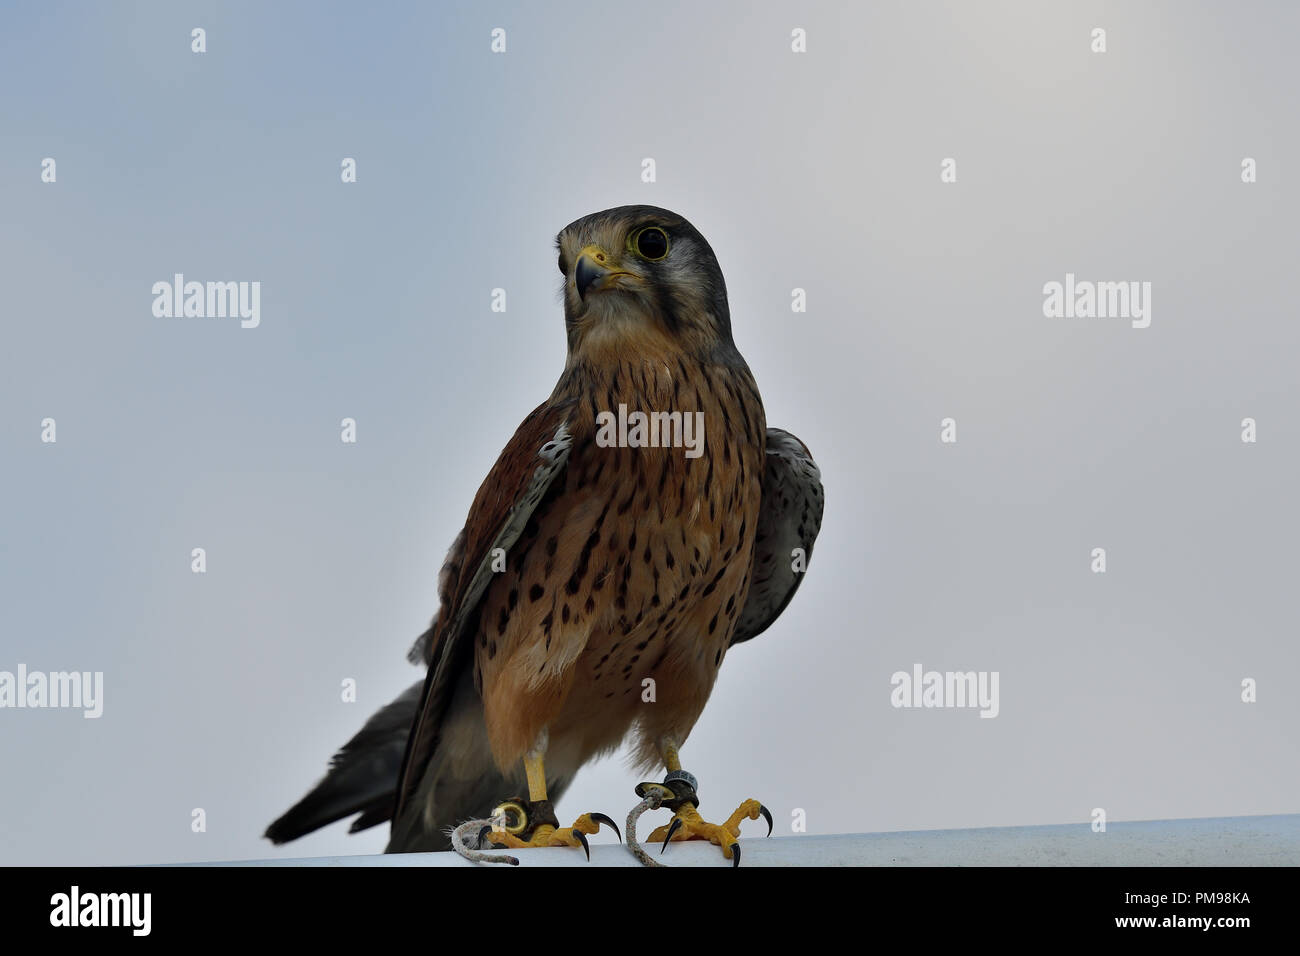 Close up portrait of a common kestrel (falco tinnunculus) - Stock Image